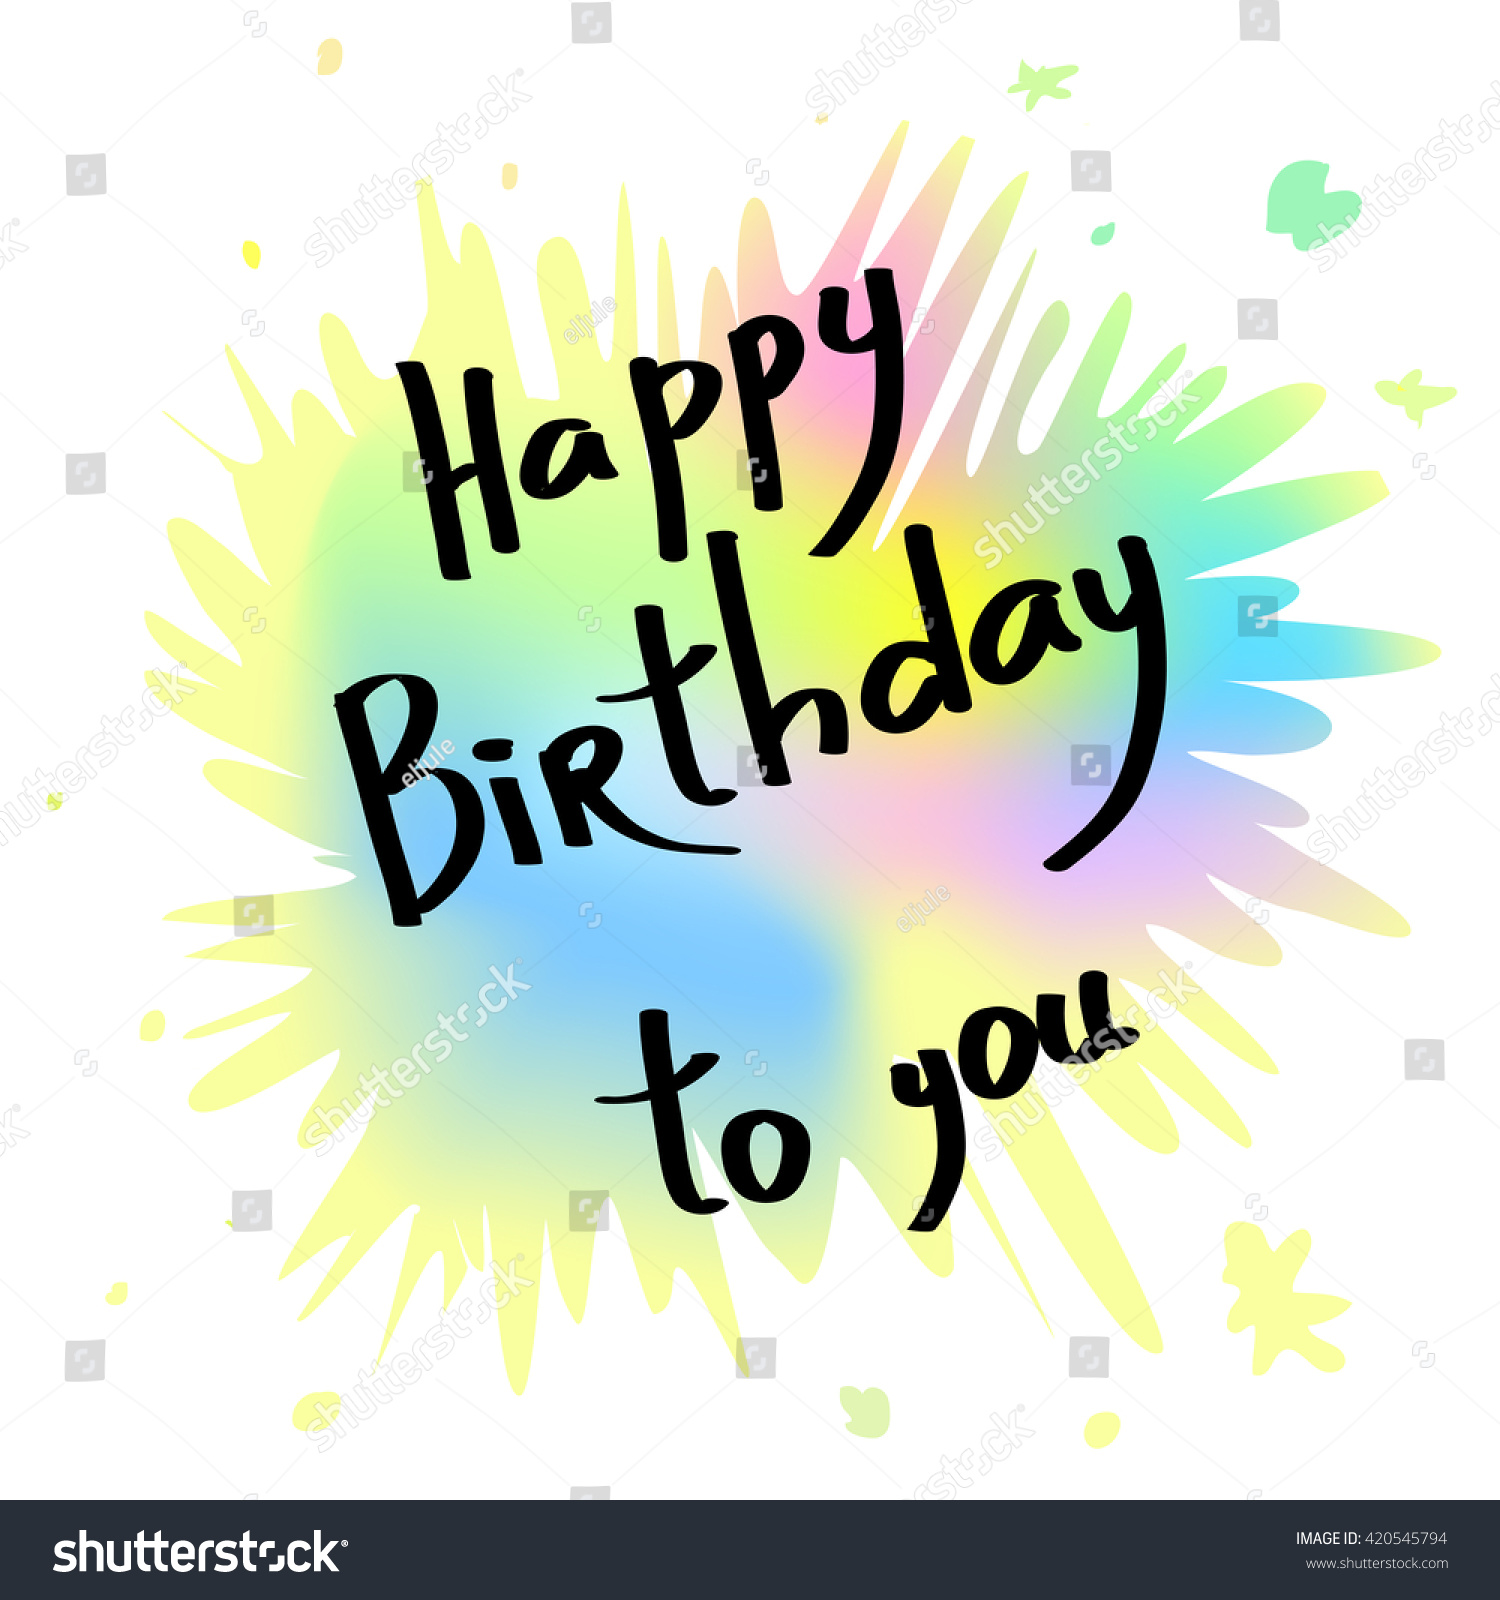 Happy birthday greeting card handwritten anniversary stock vector happy birthday greeting card handwritten anniversary banner happy birthday to you kristyandbryce Gallery